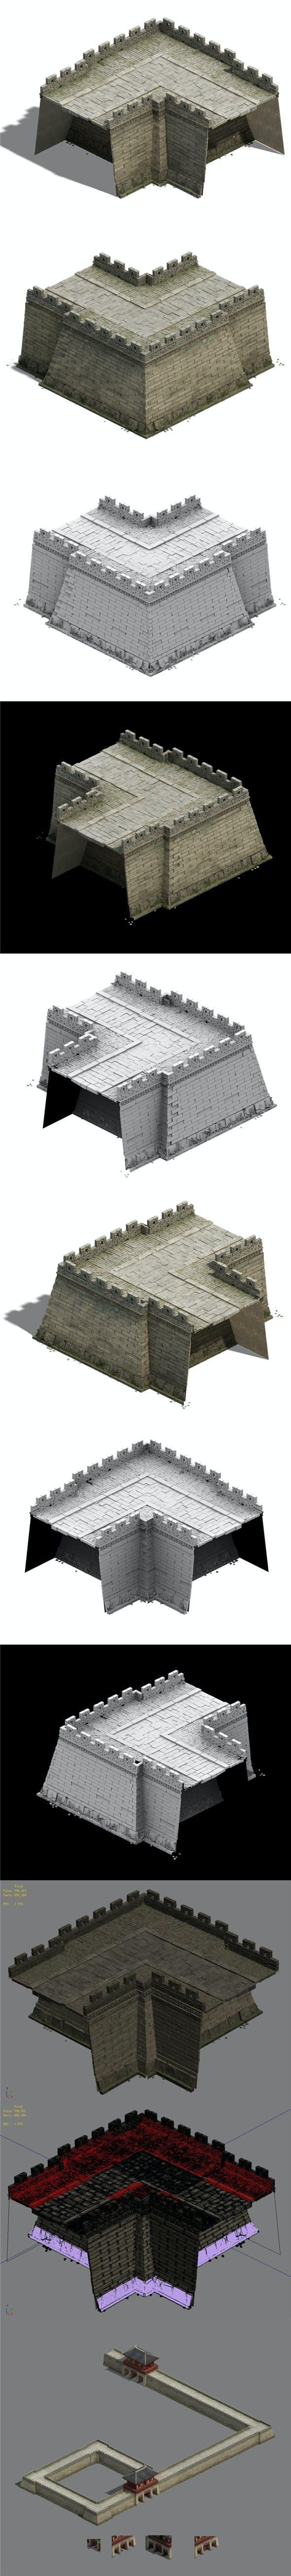 City Gate - City Wall - City Corner 02 - 3DOcean Item for Sale